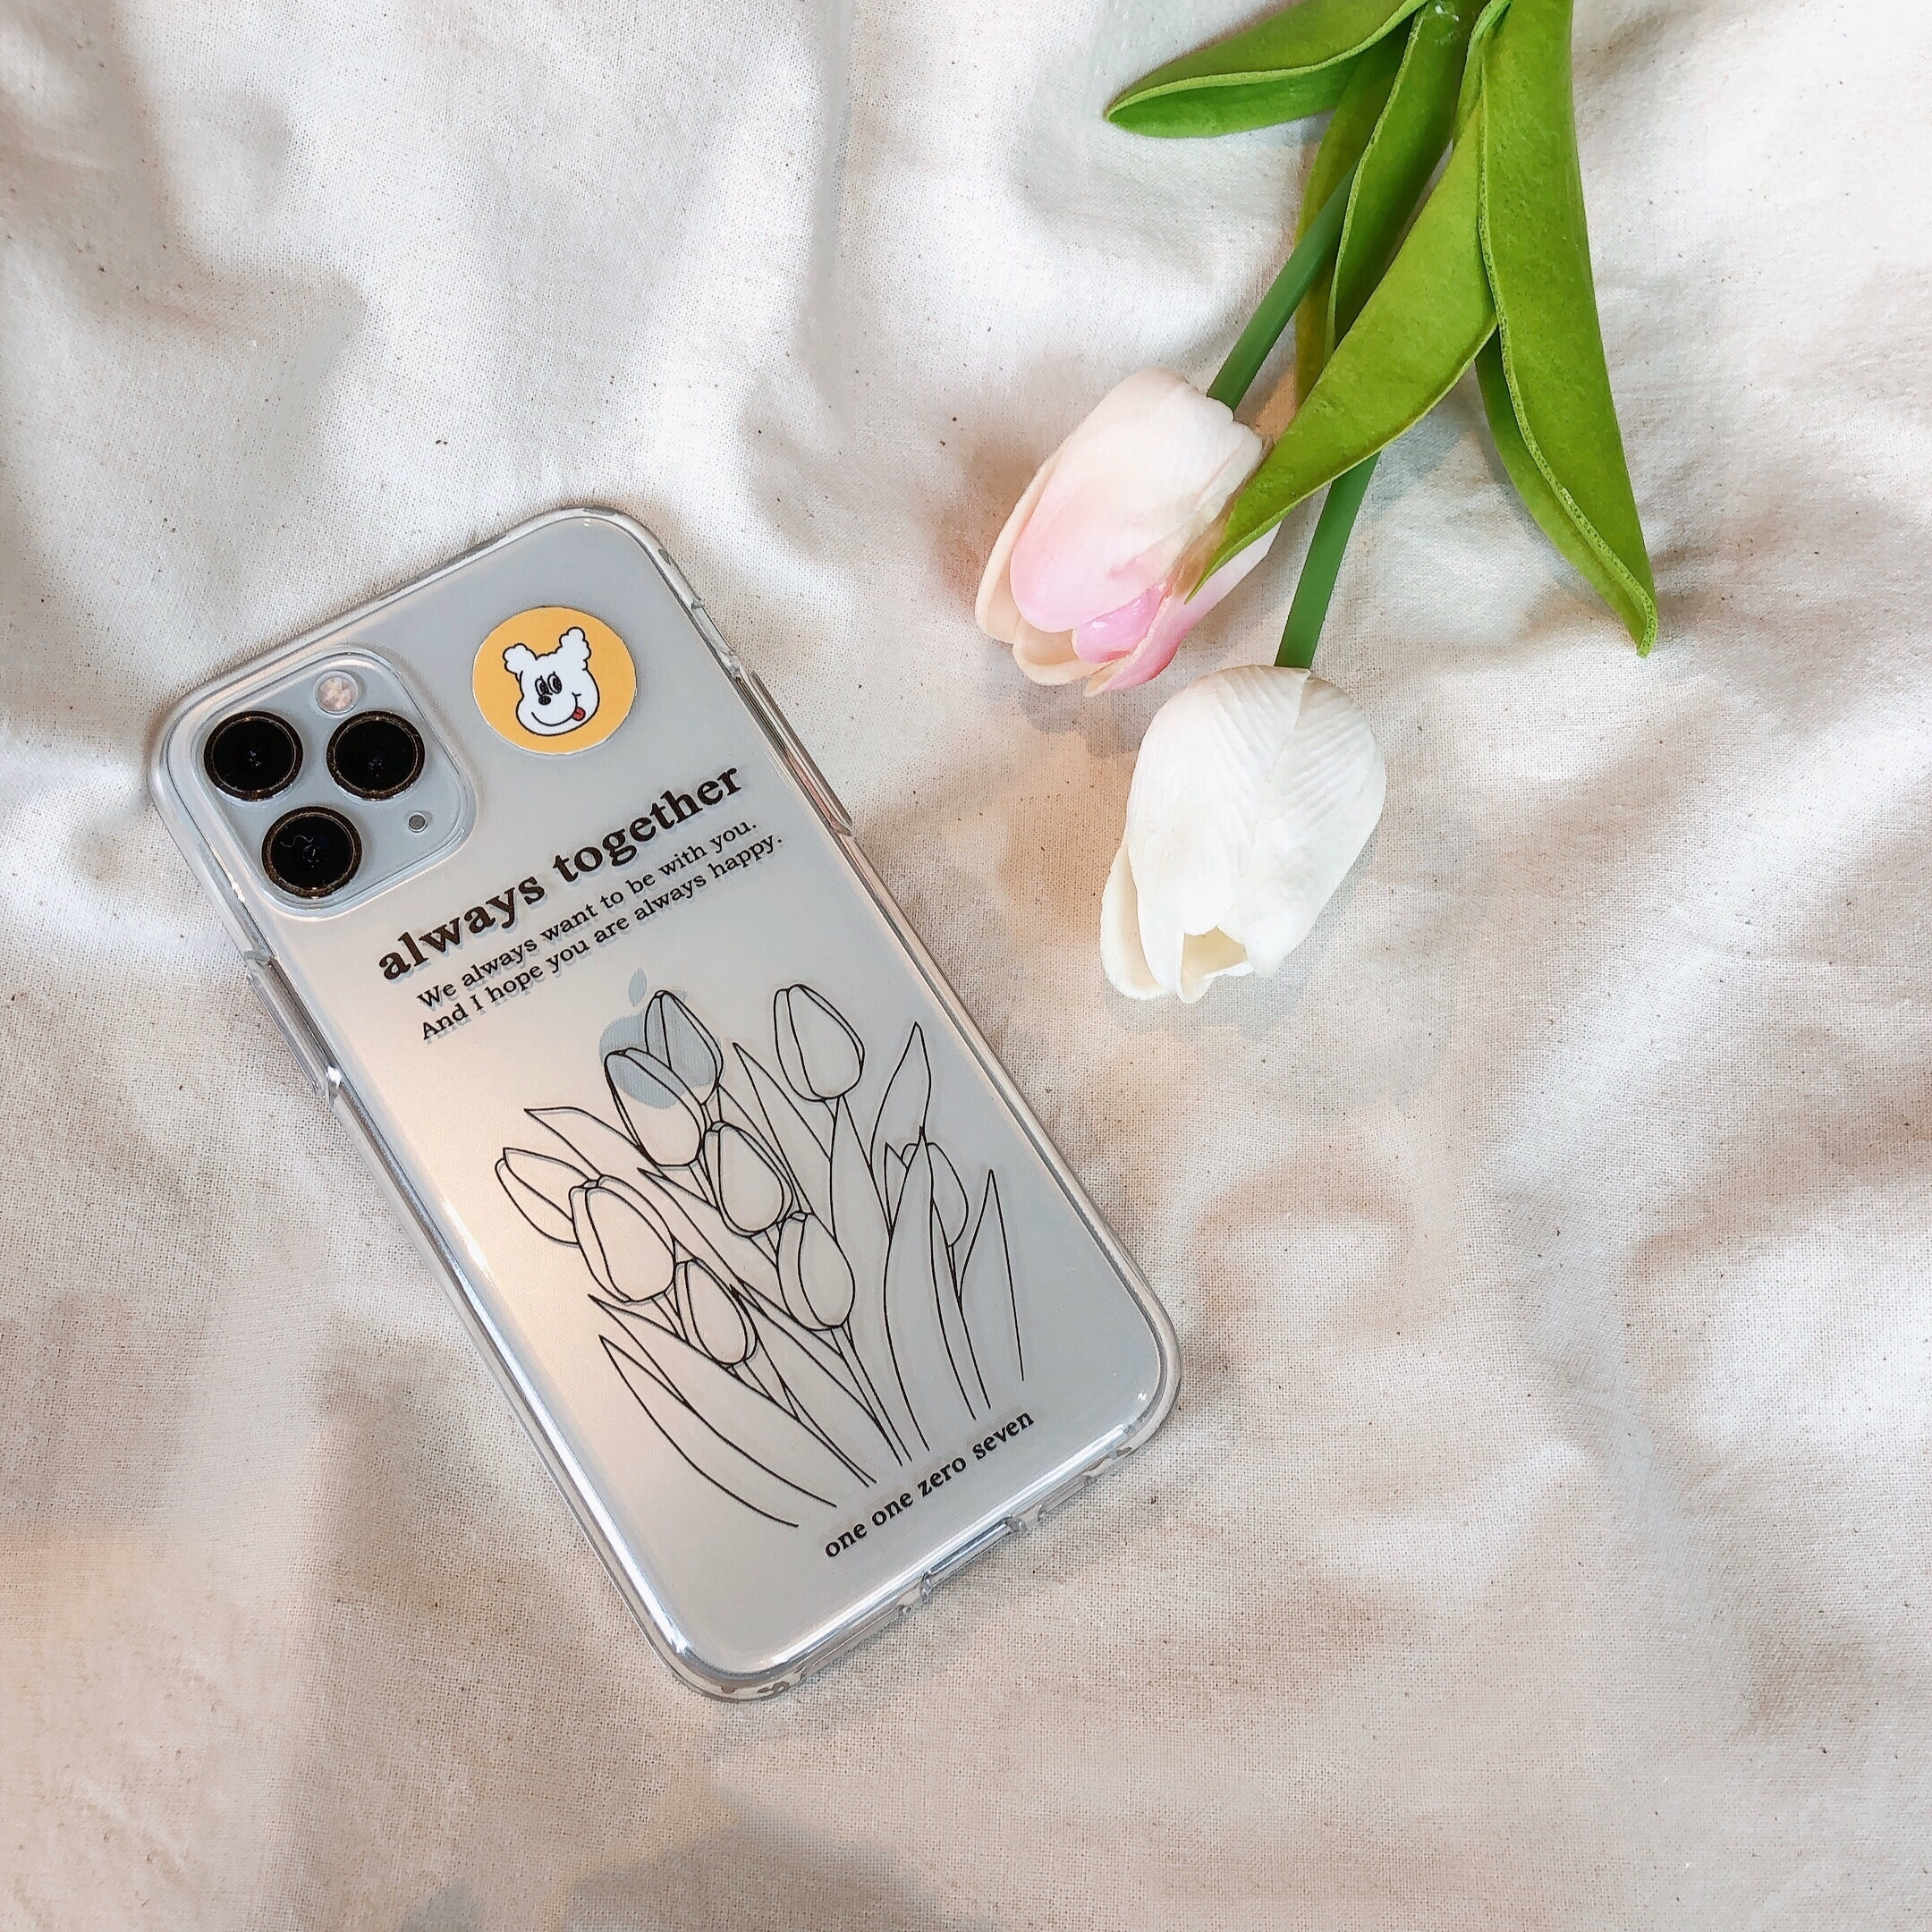 [OA-49] チューリップ クリア iPhoneケース(モノクロ)